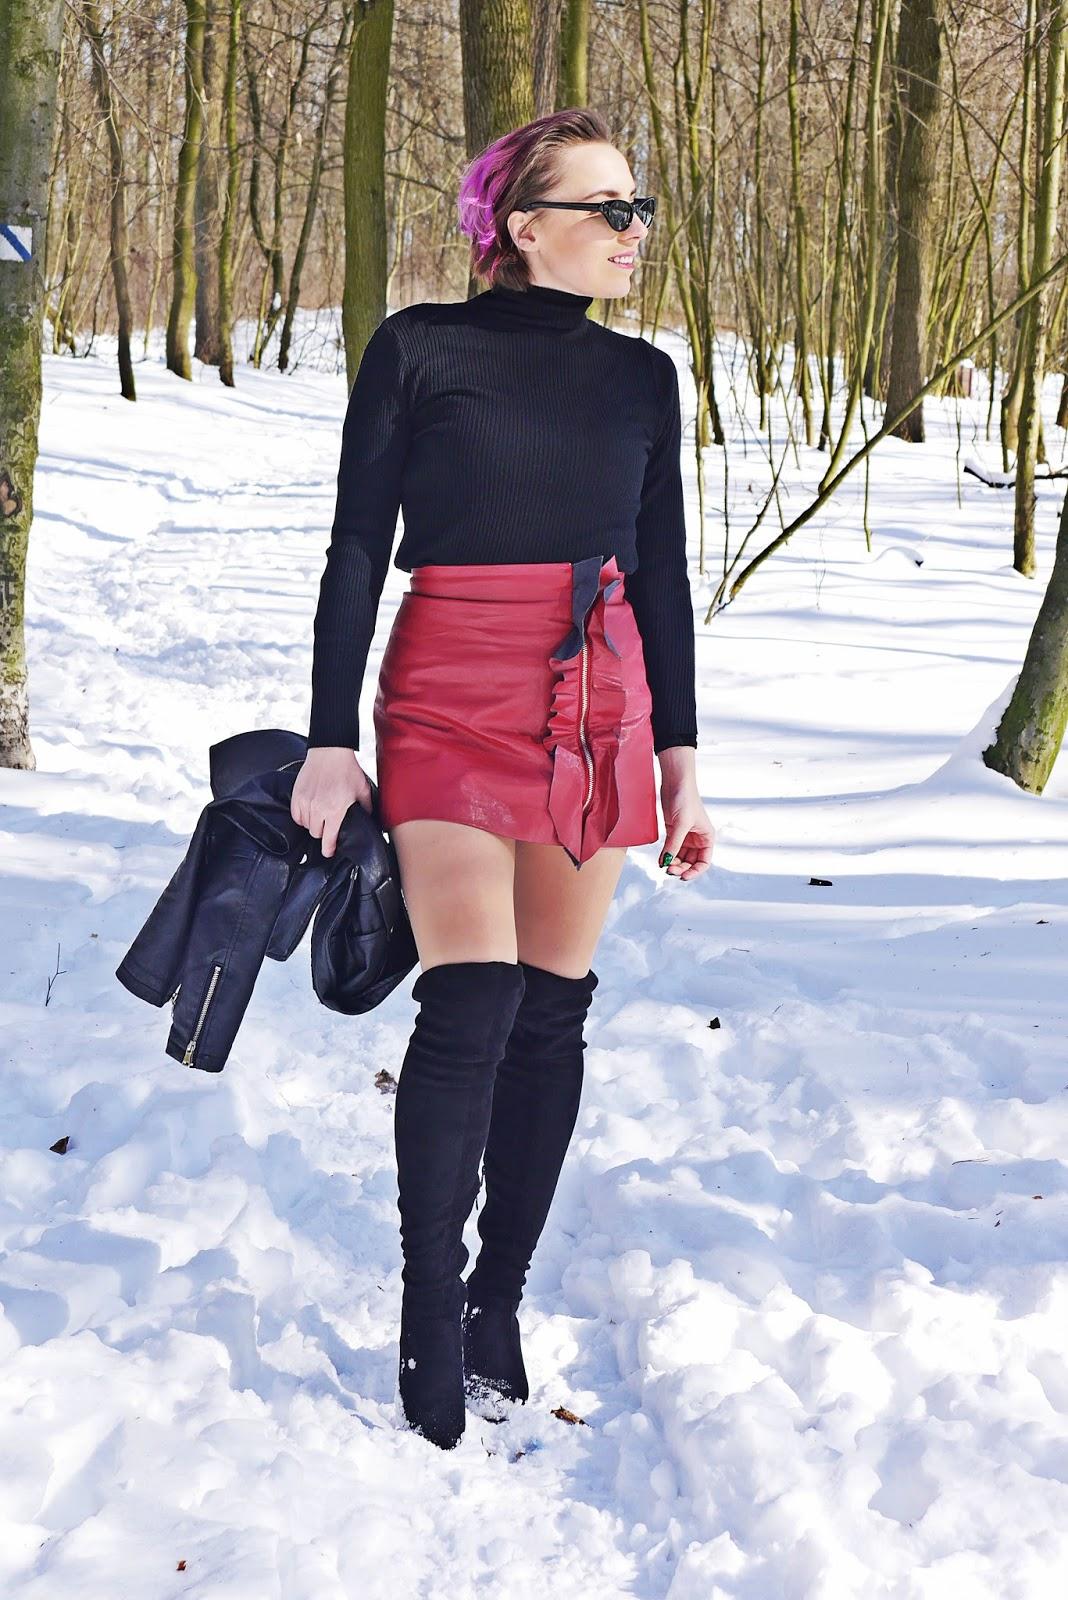 1_kozaki_za_kolano_renee_skorzana_spodnica_golf_karyn_blog_modowy_180318a